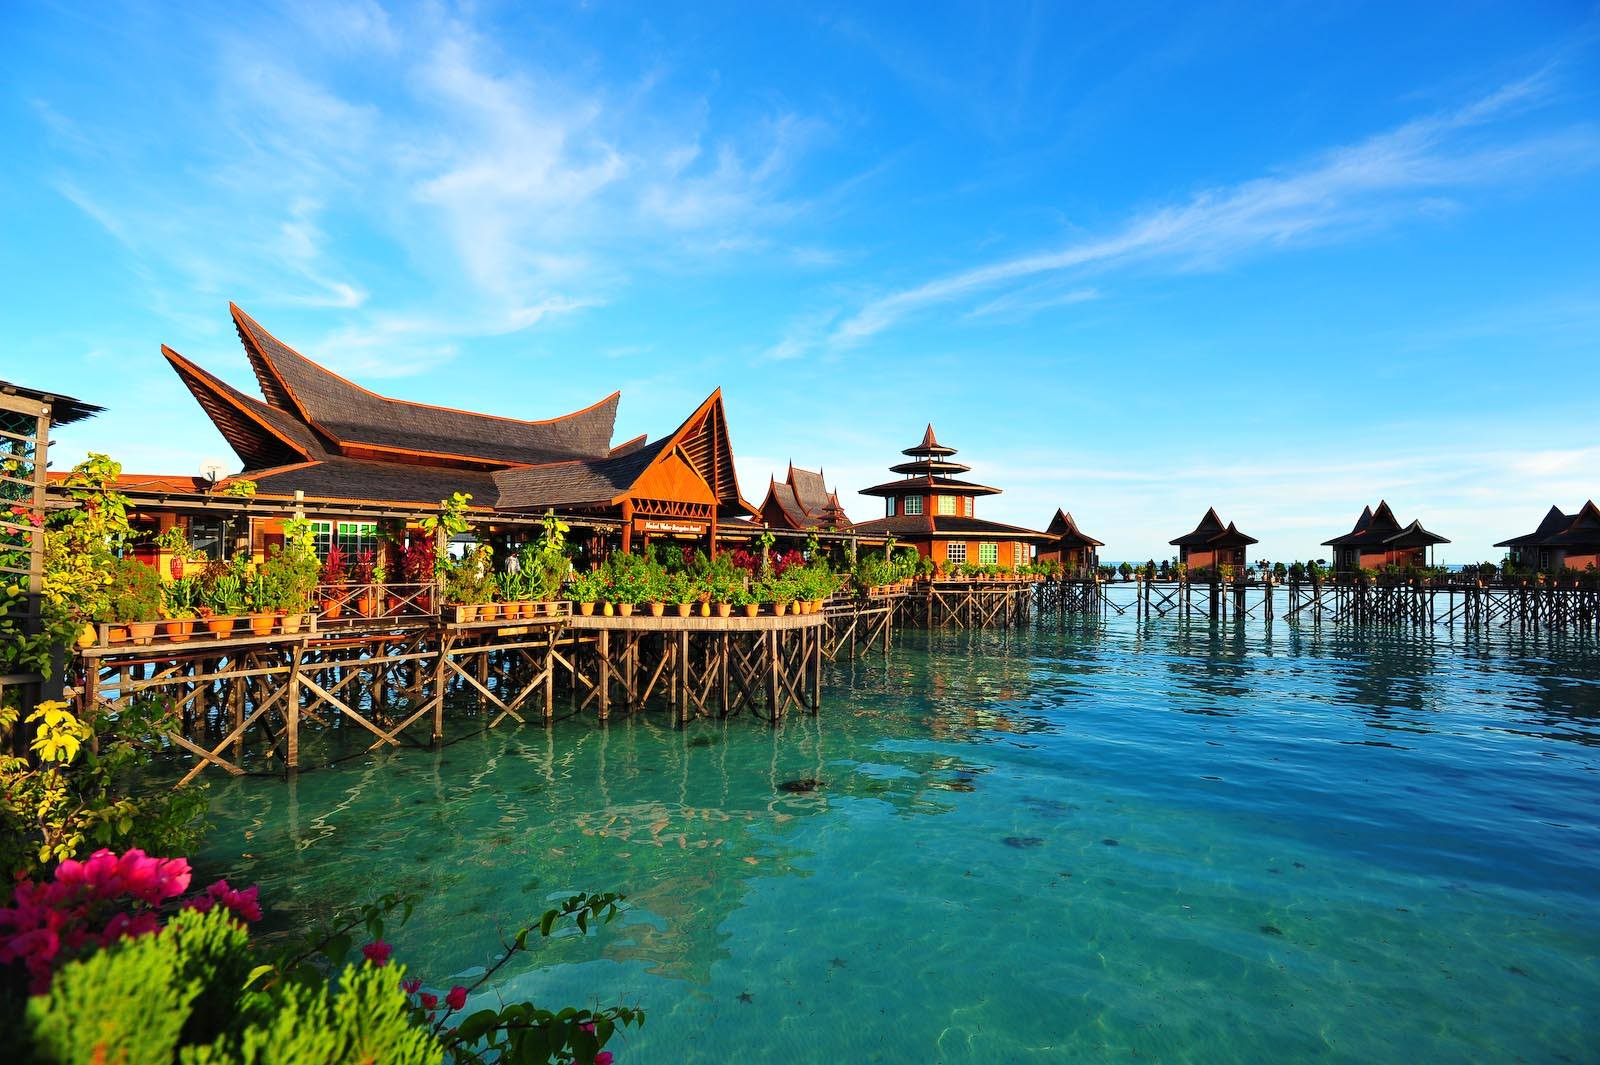 Mabul Water Bungalows, Mabul Island, Sabah